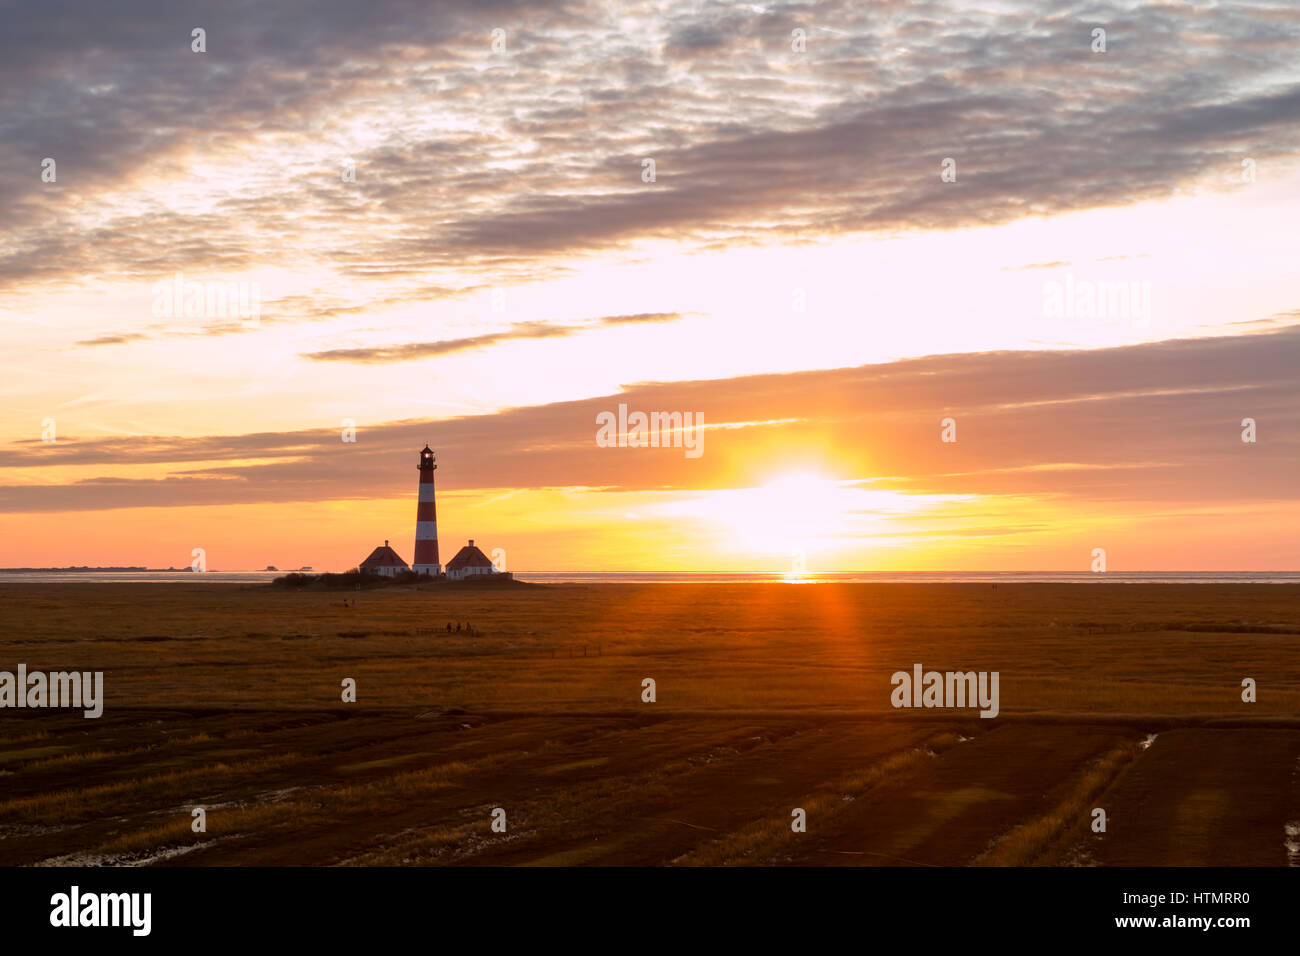 Sunset at the lighthouse Westerheversand, North Frisia, Germany Stock Photo